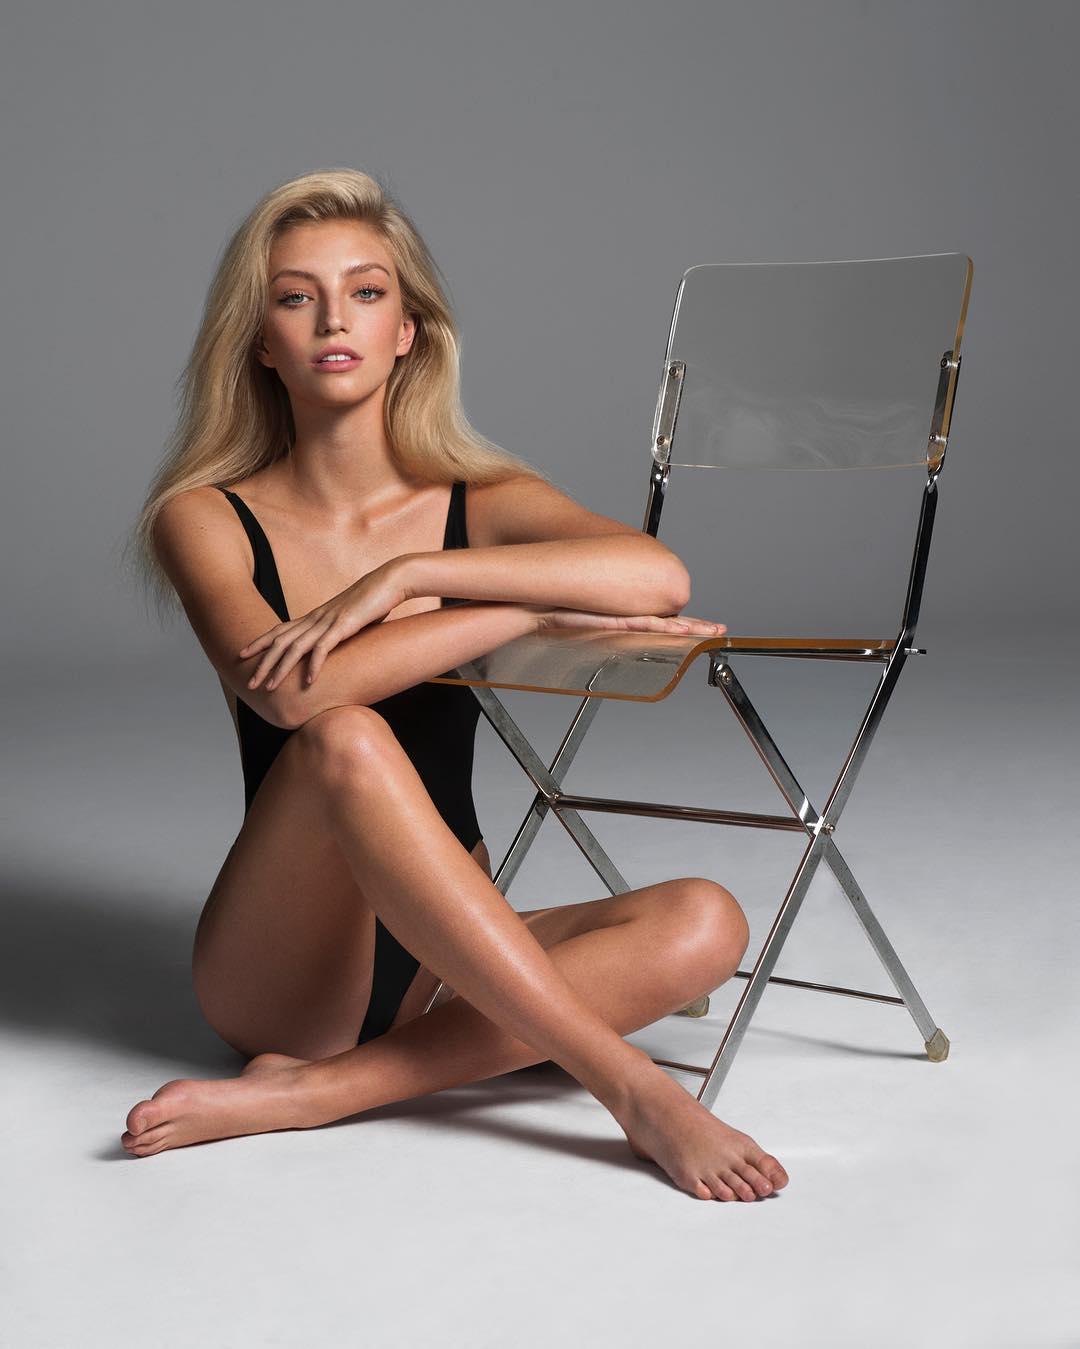 Niamh Adkins nudes (19 pics), photo Feet, YouTube, swimsuit 2018